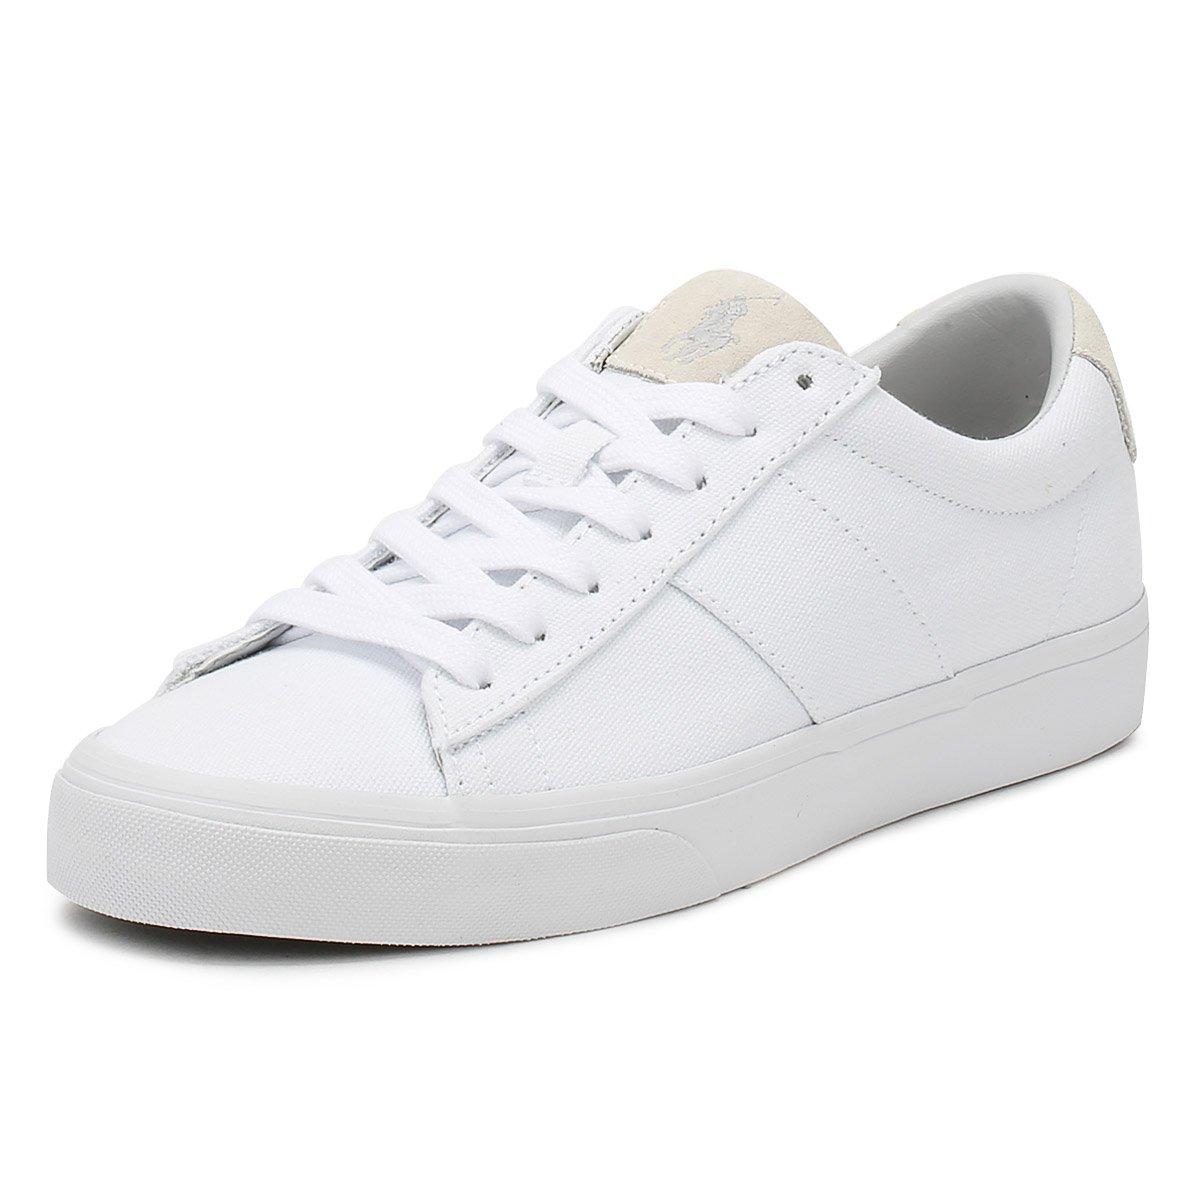 55f61f186c1c Ralph Lauren Sneaker 816-688479-003 Sayer-NE  Amazon.co.uk  Shoes   Bags